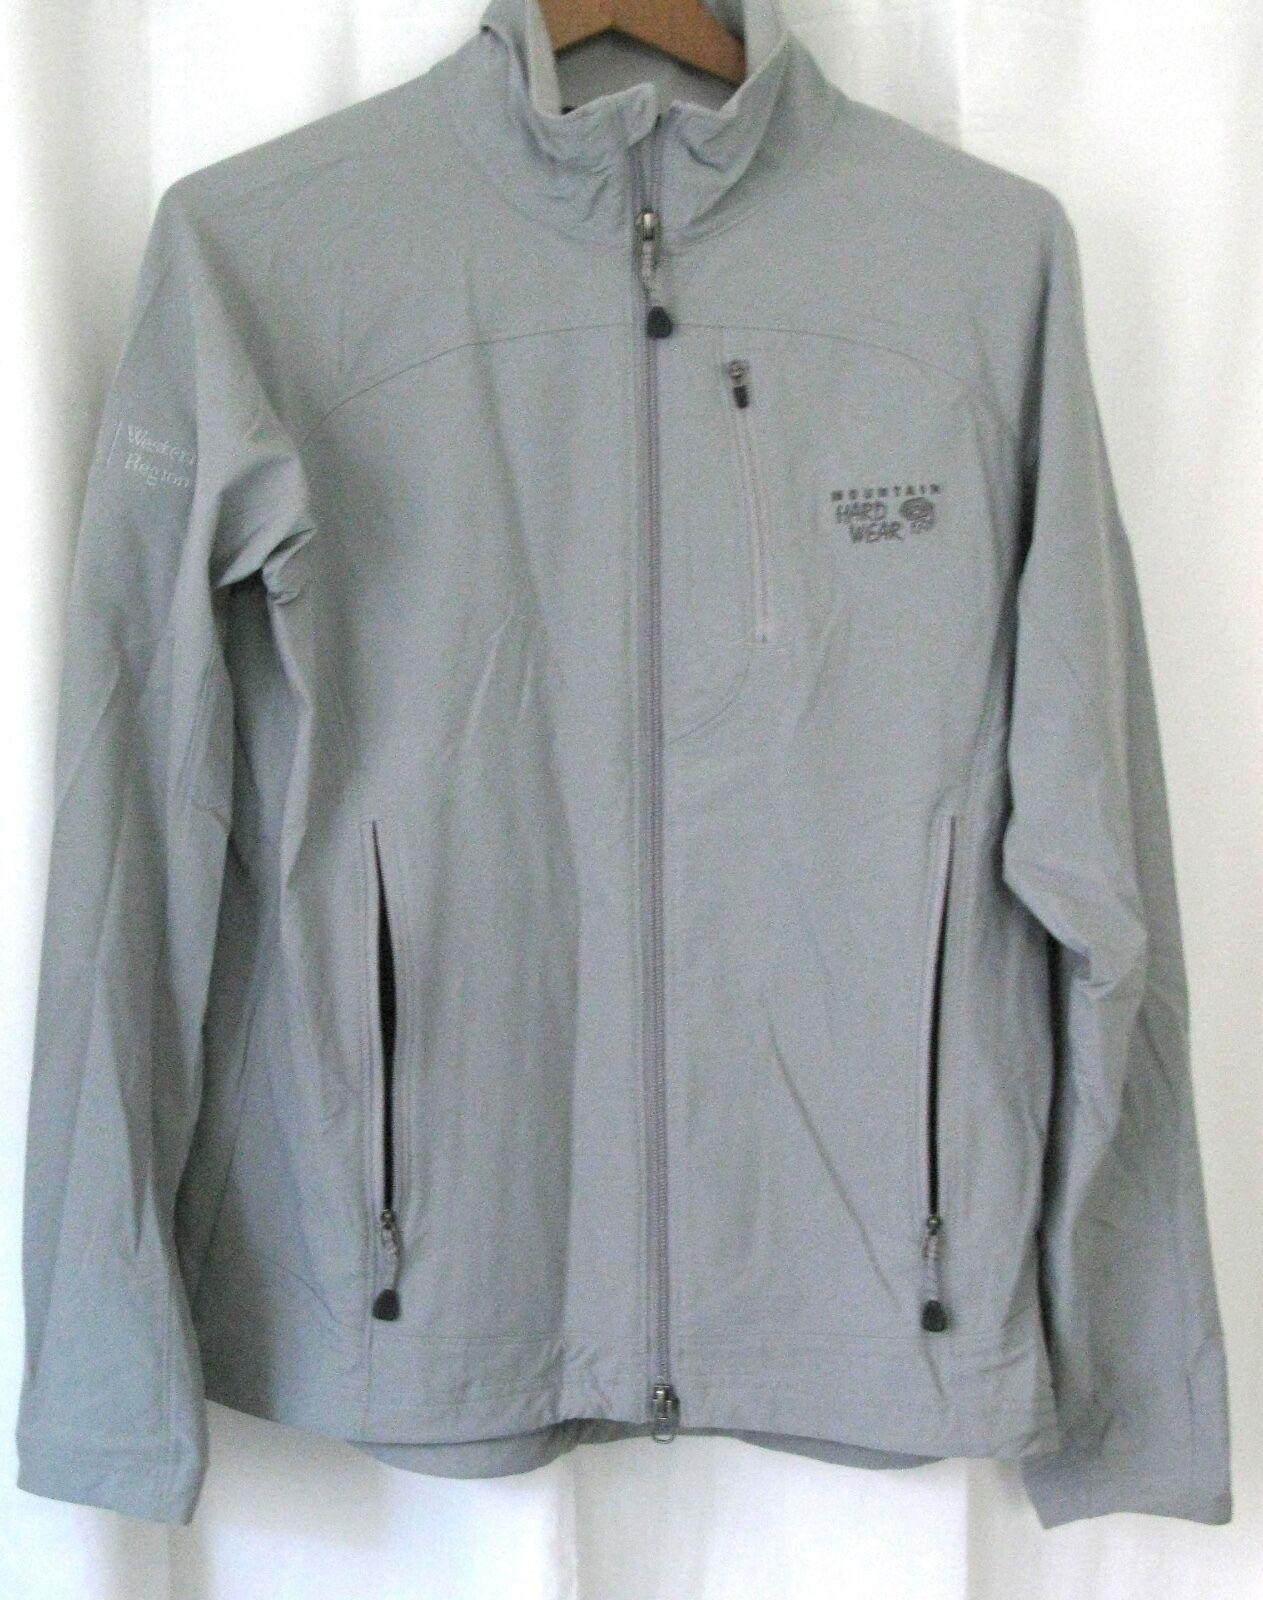 161864 Women's M MOUNTAIN HARDWEAR Grey Stretch Nylon Jacket EUC